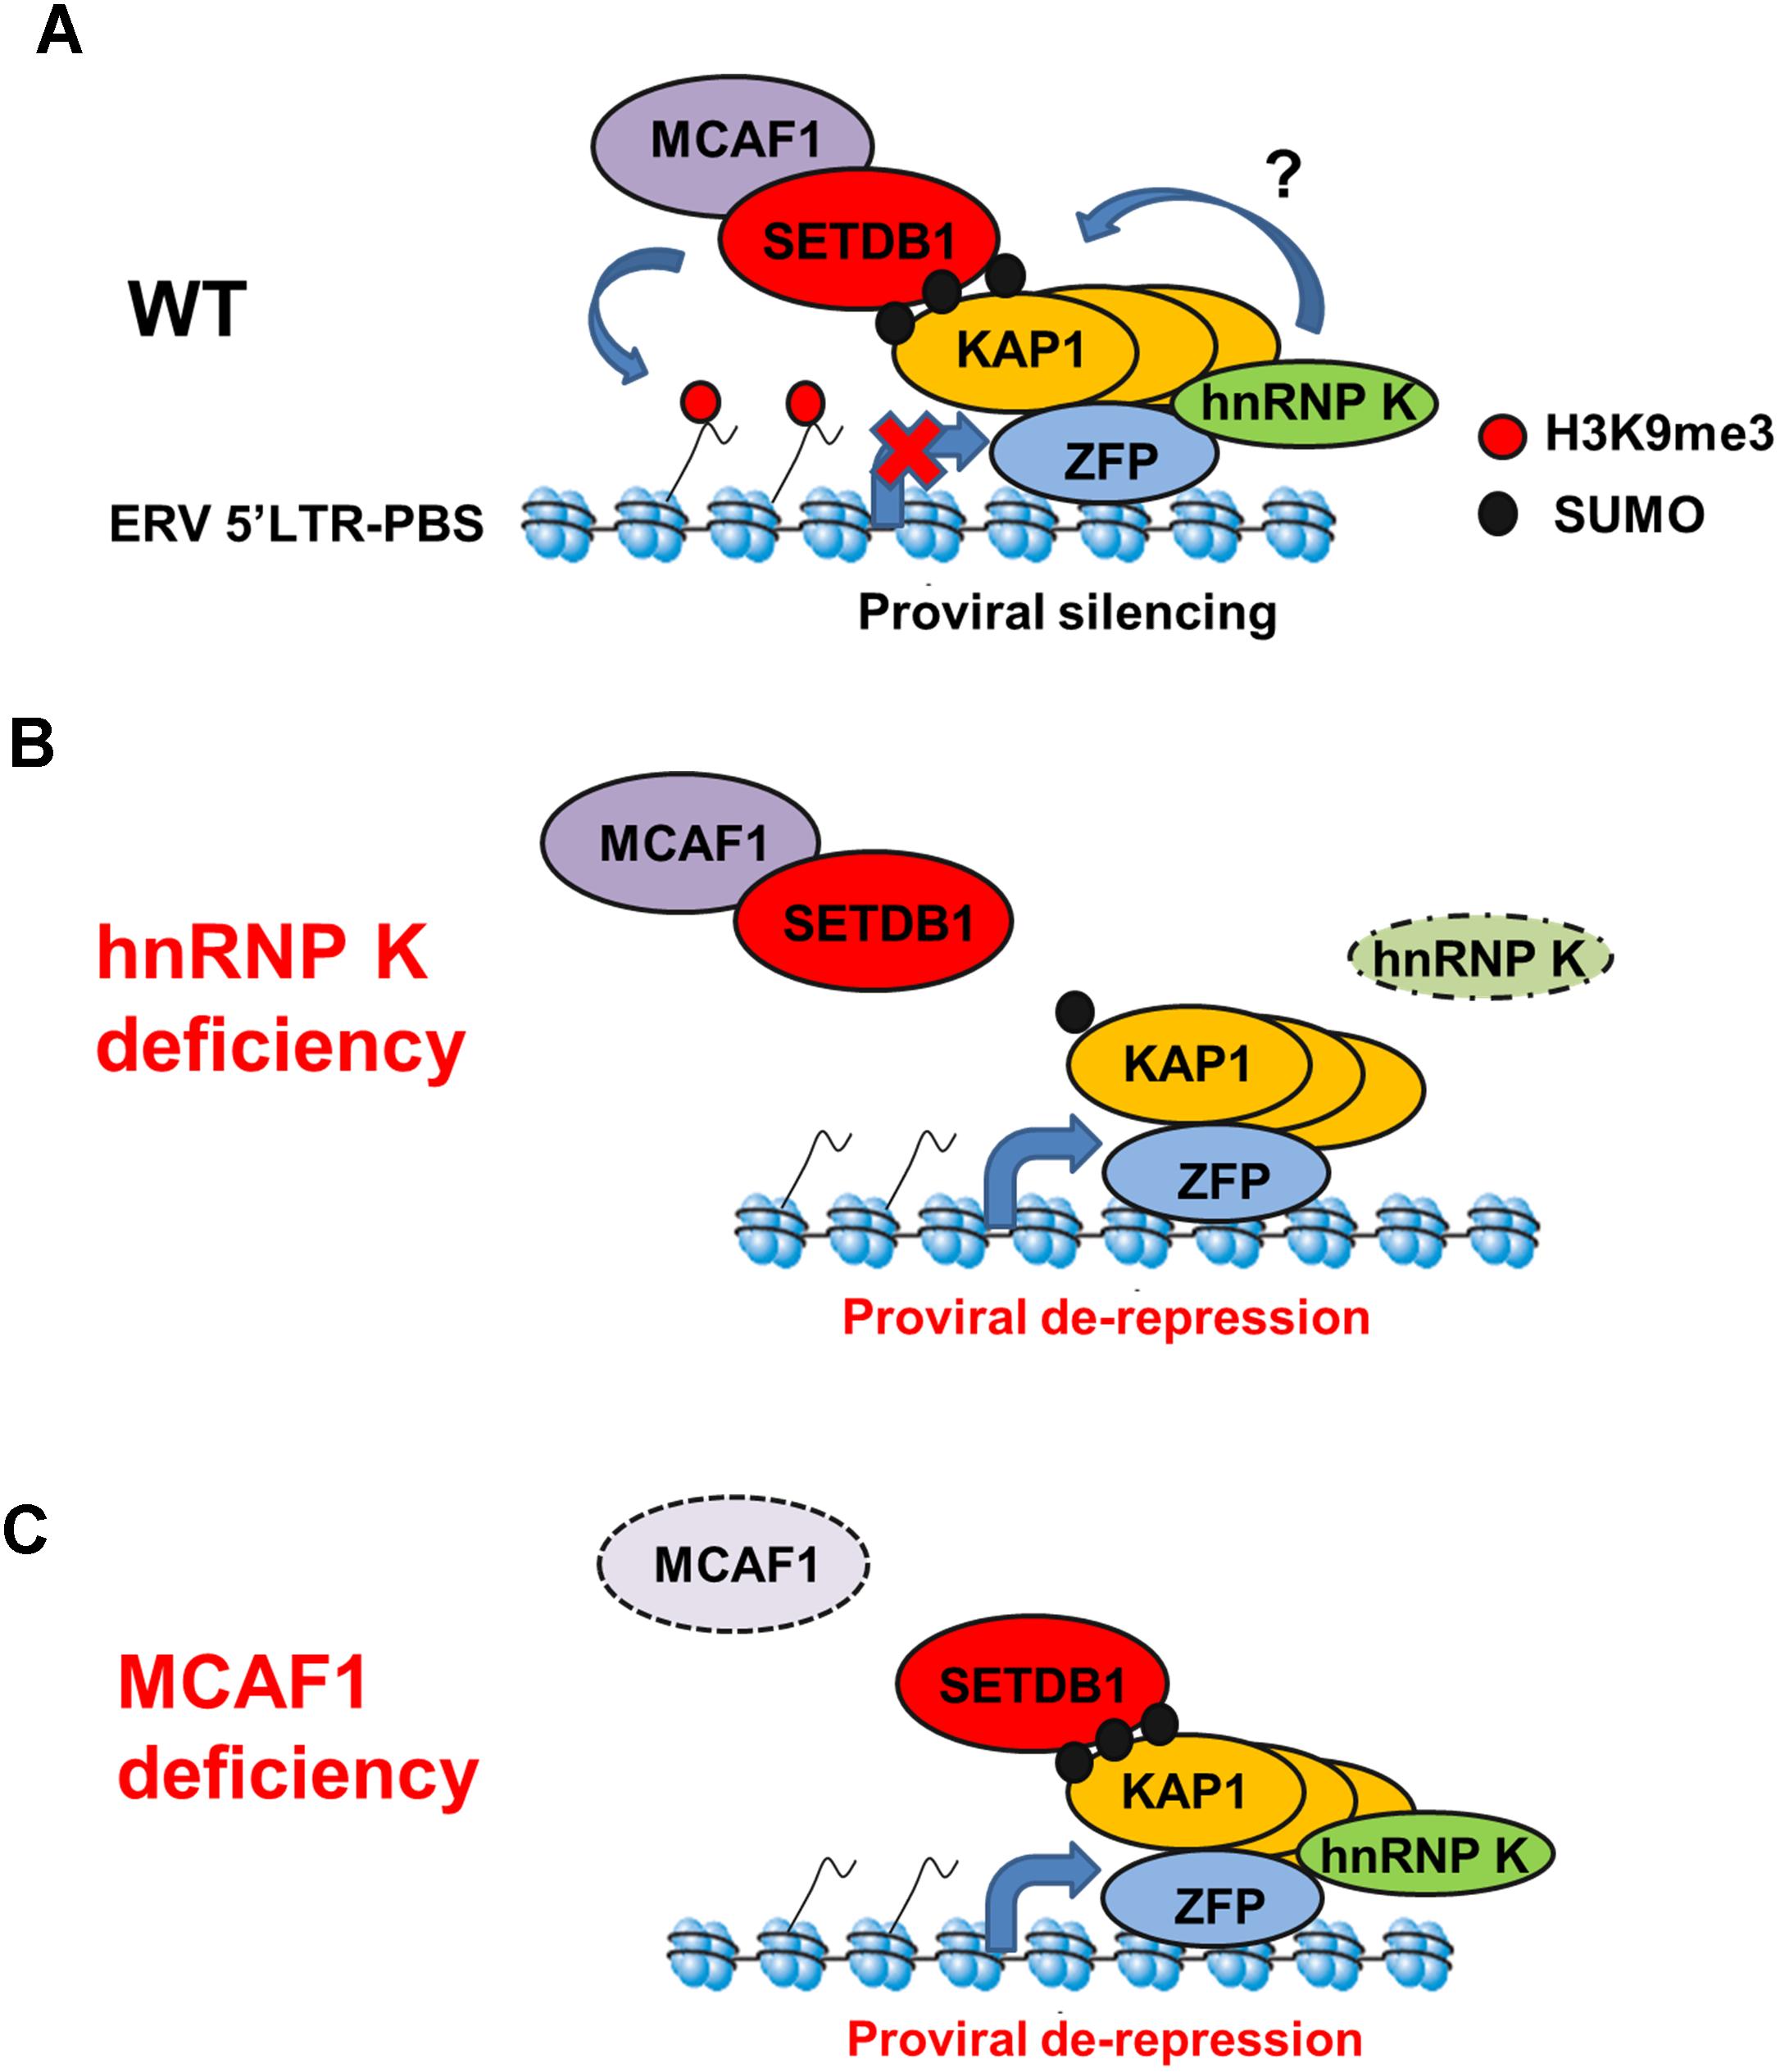 Model for SETDB1/KAP1-mediated proviral silencing pathway.